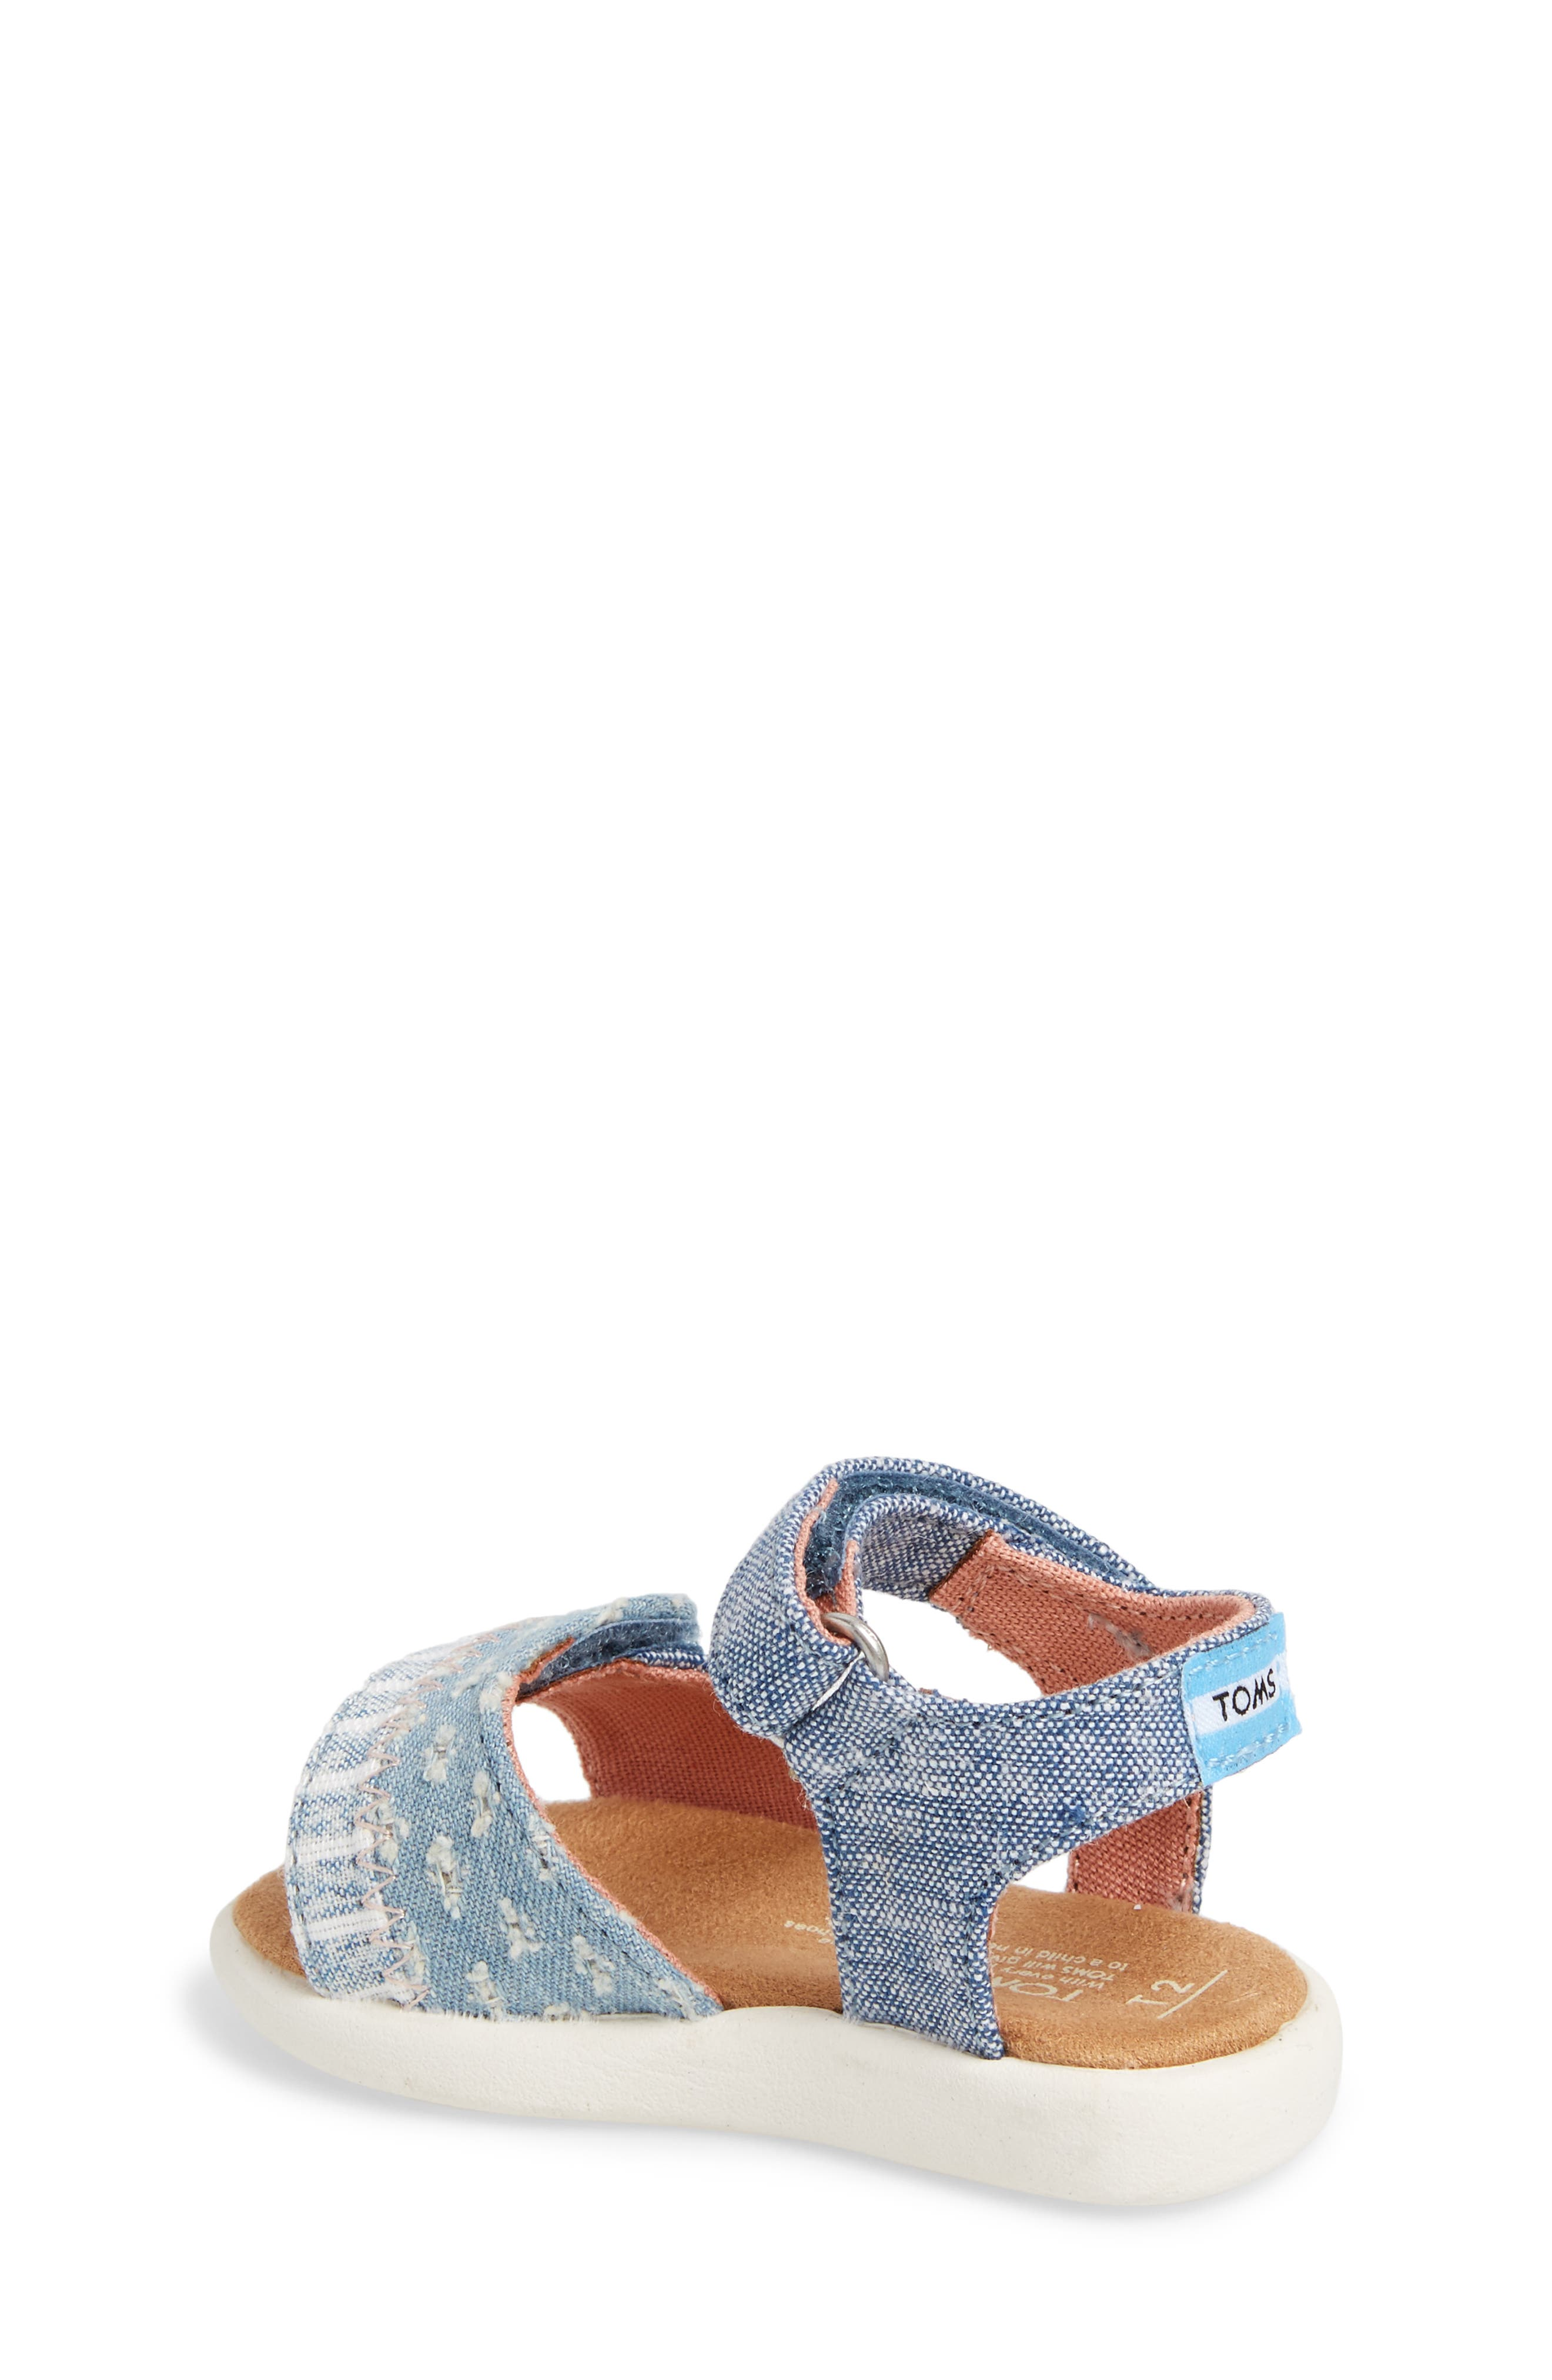 Strappy Sandal,                             Alternate thumbnail 2, color,                             Blue Slub Chambray